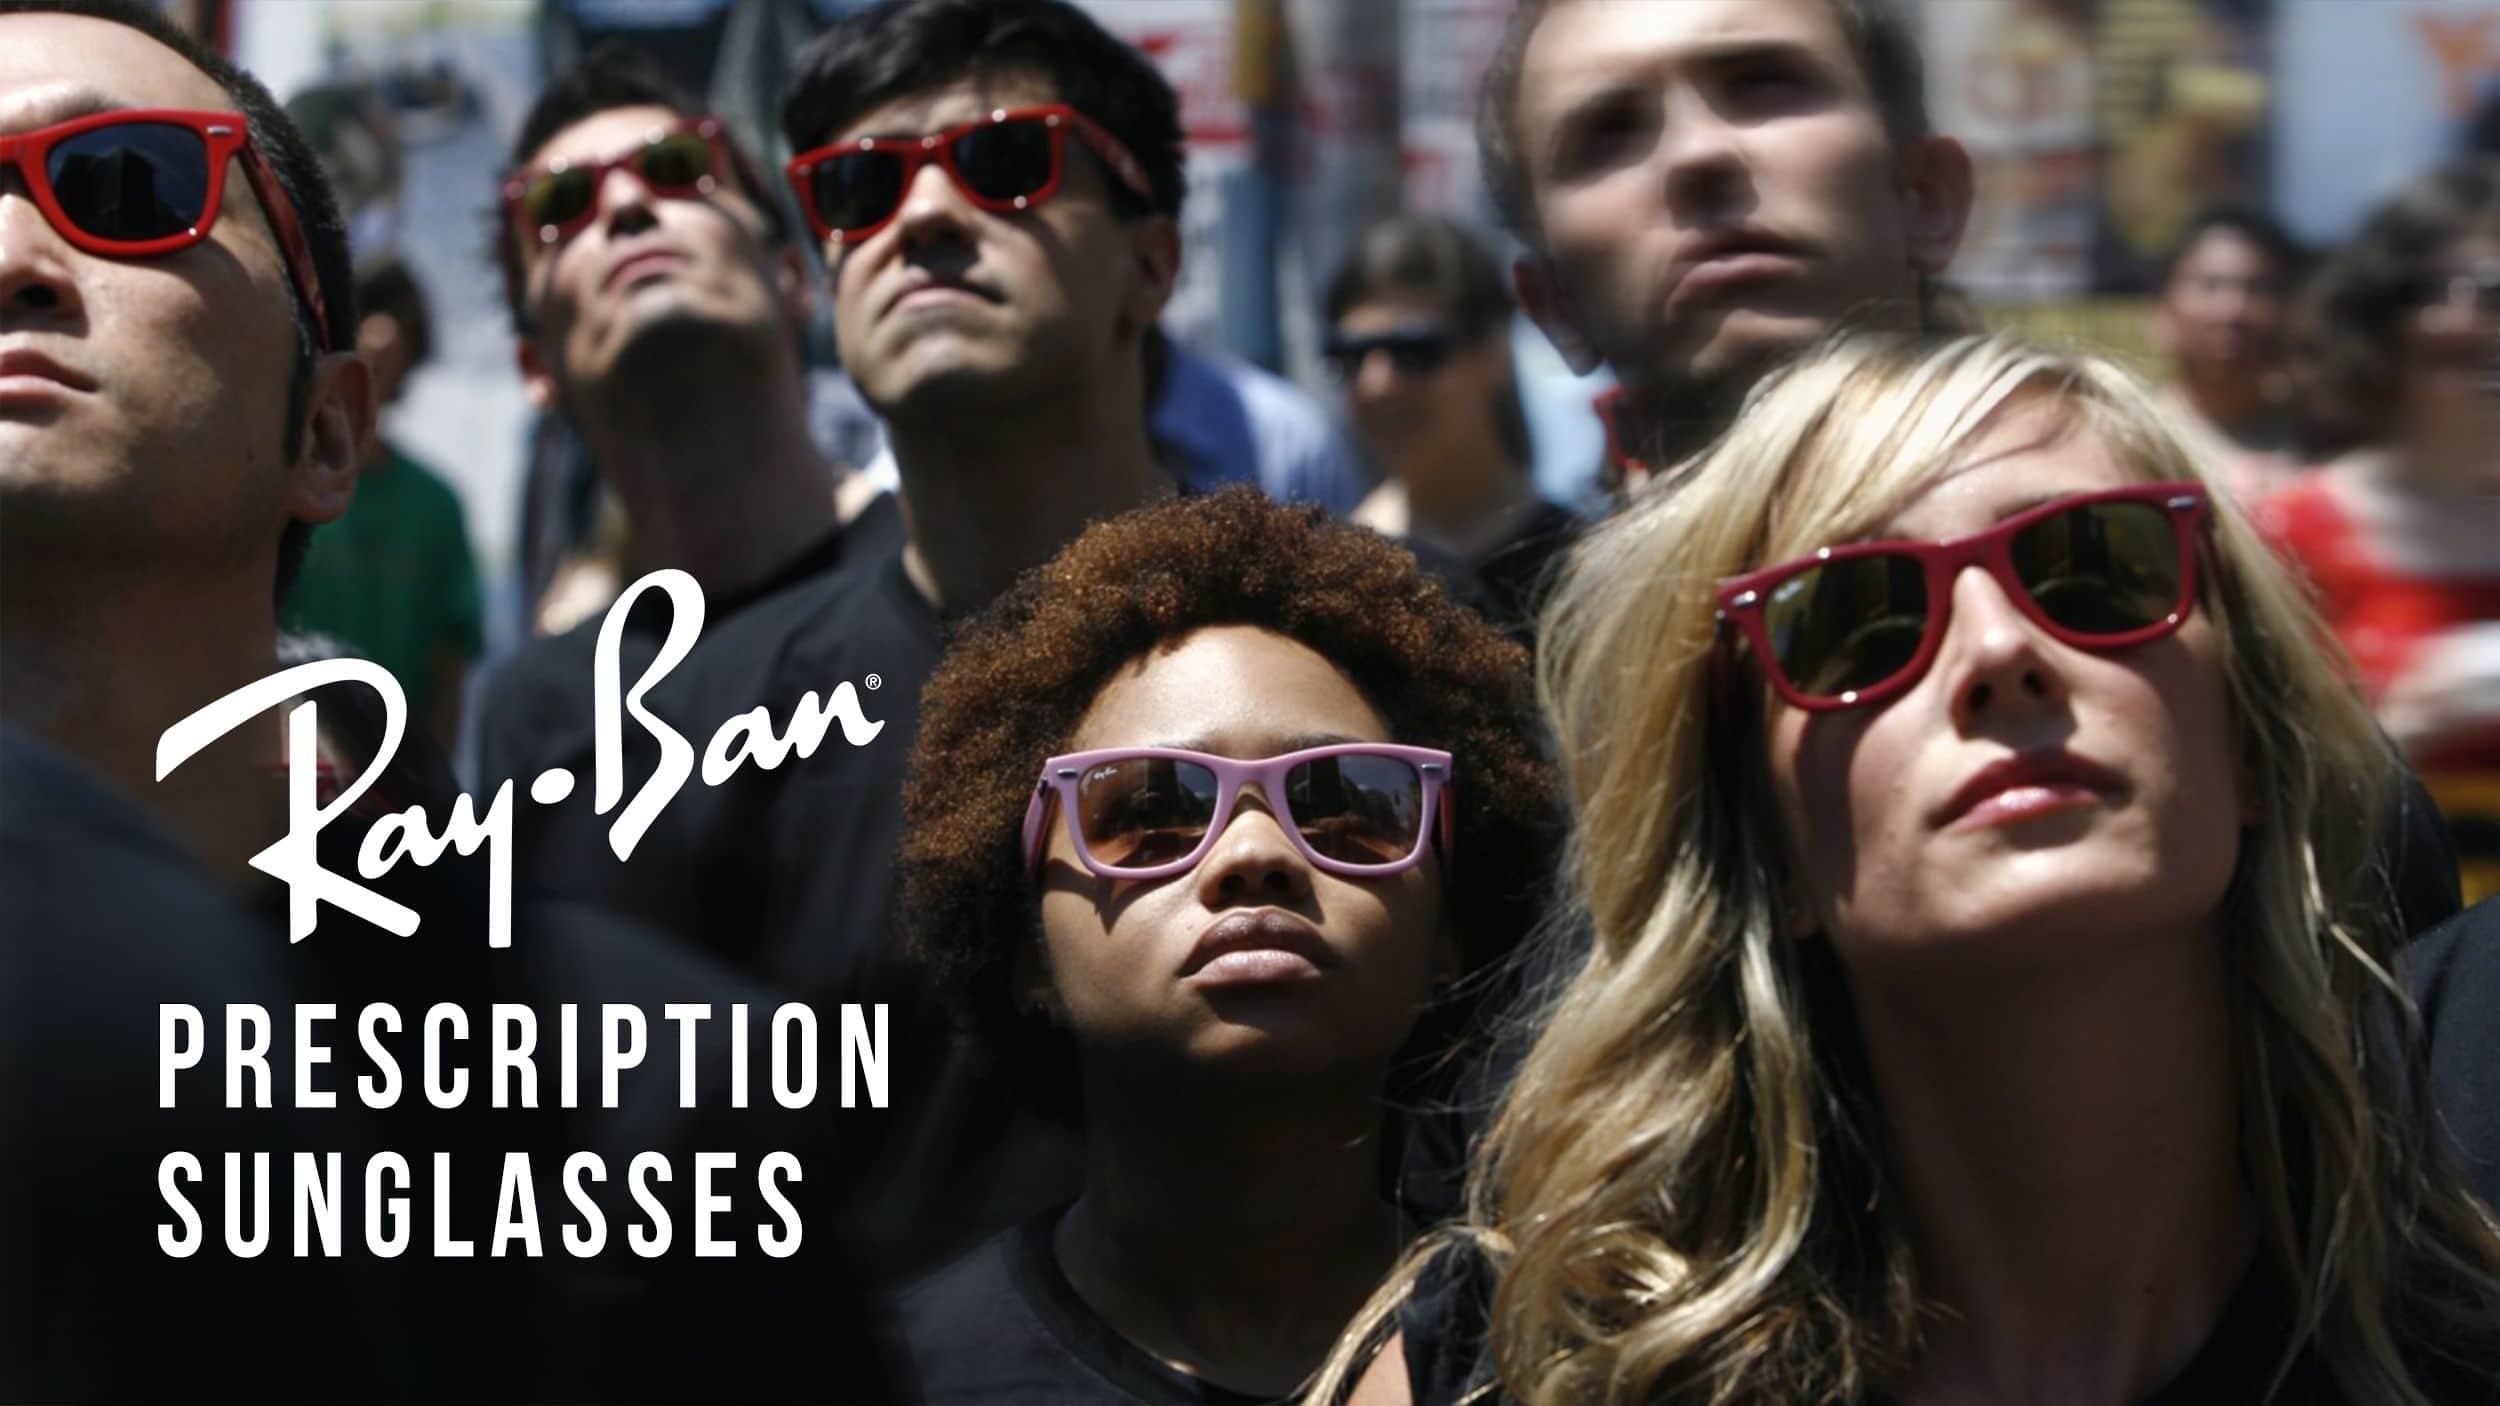 Ray Ban Prescription Sunglasses Header